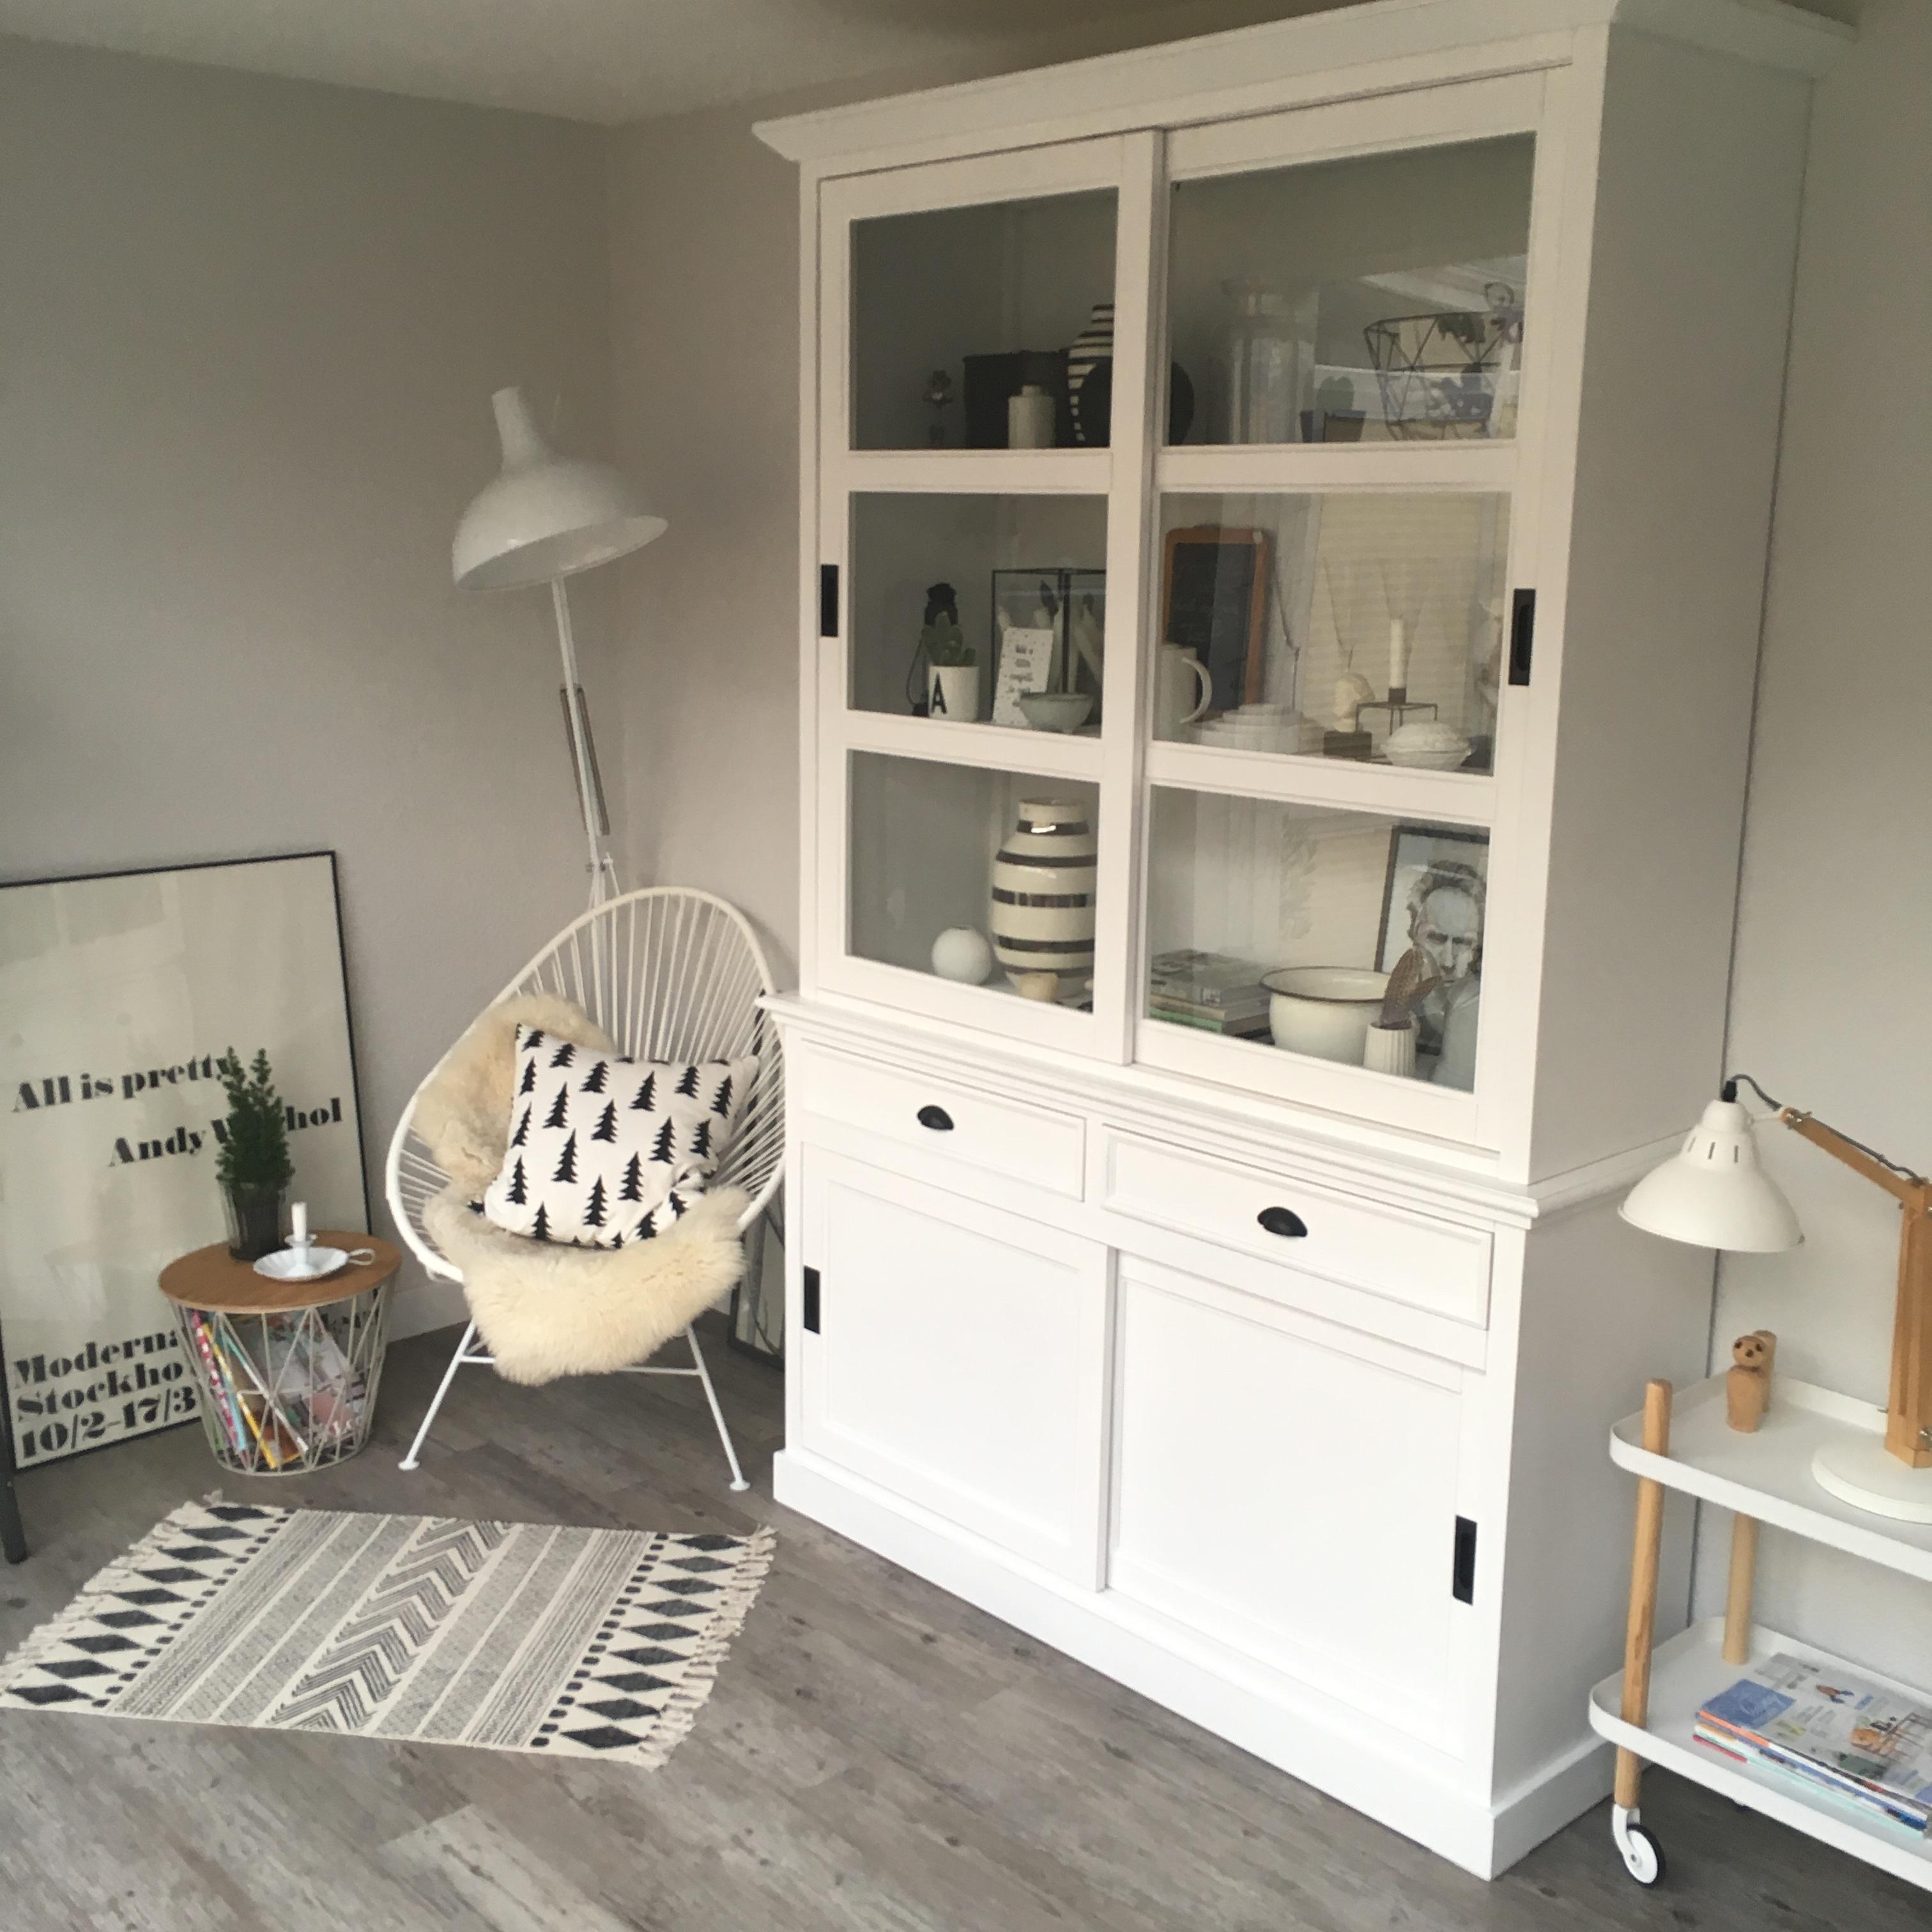 Wintergarten Whiteliving Whiteinterior Livingroom